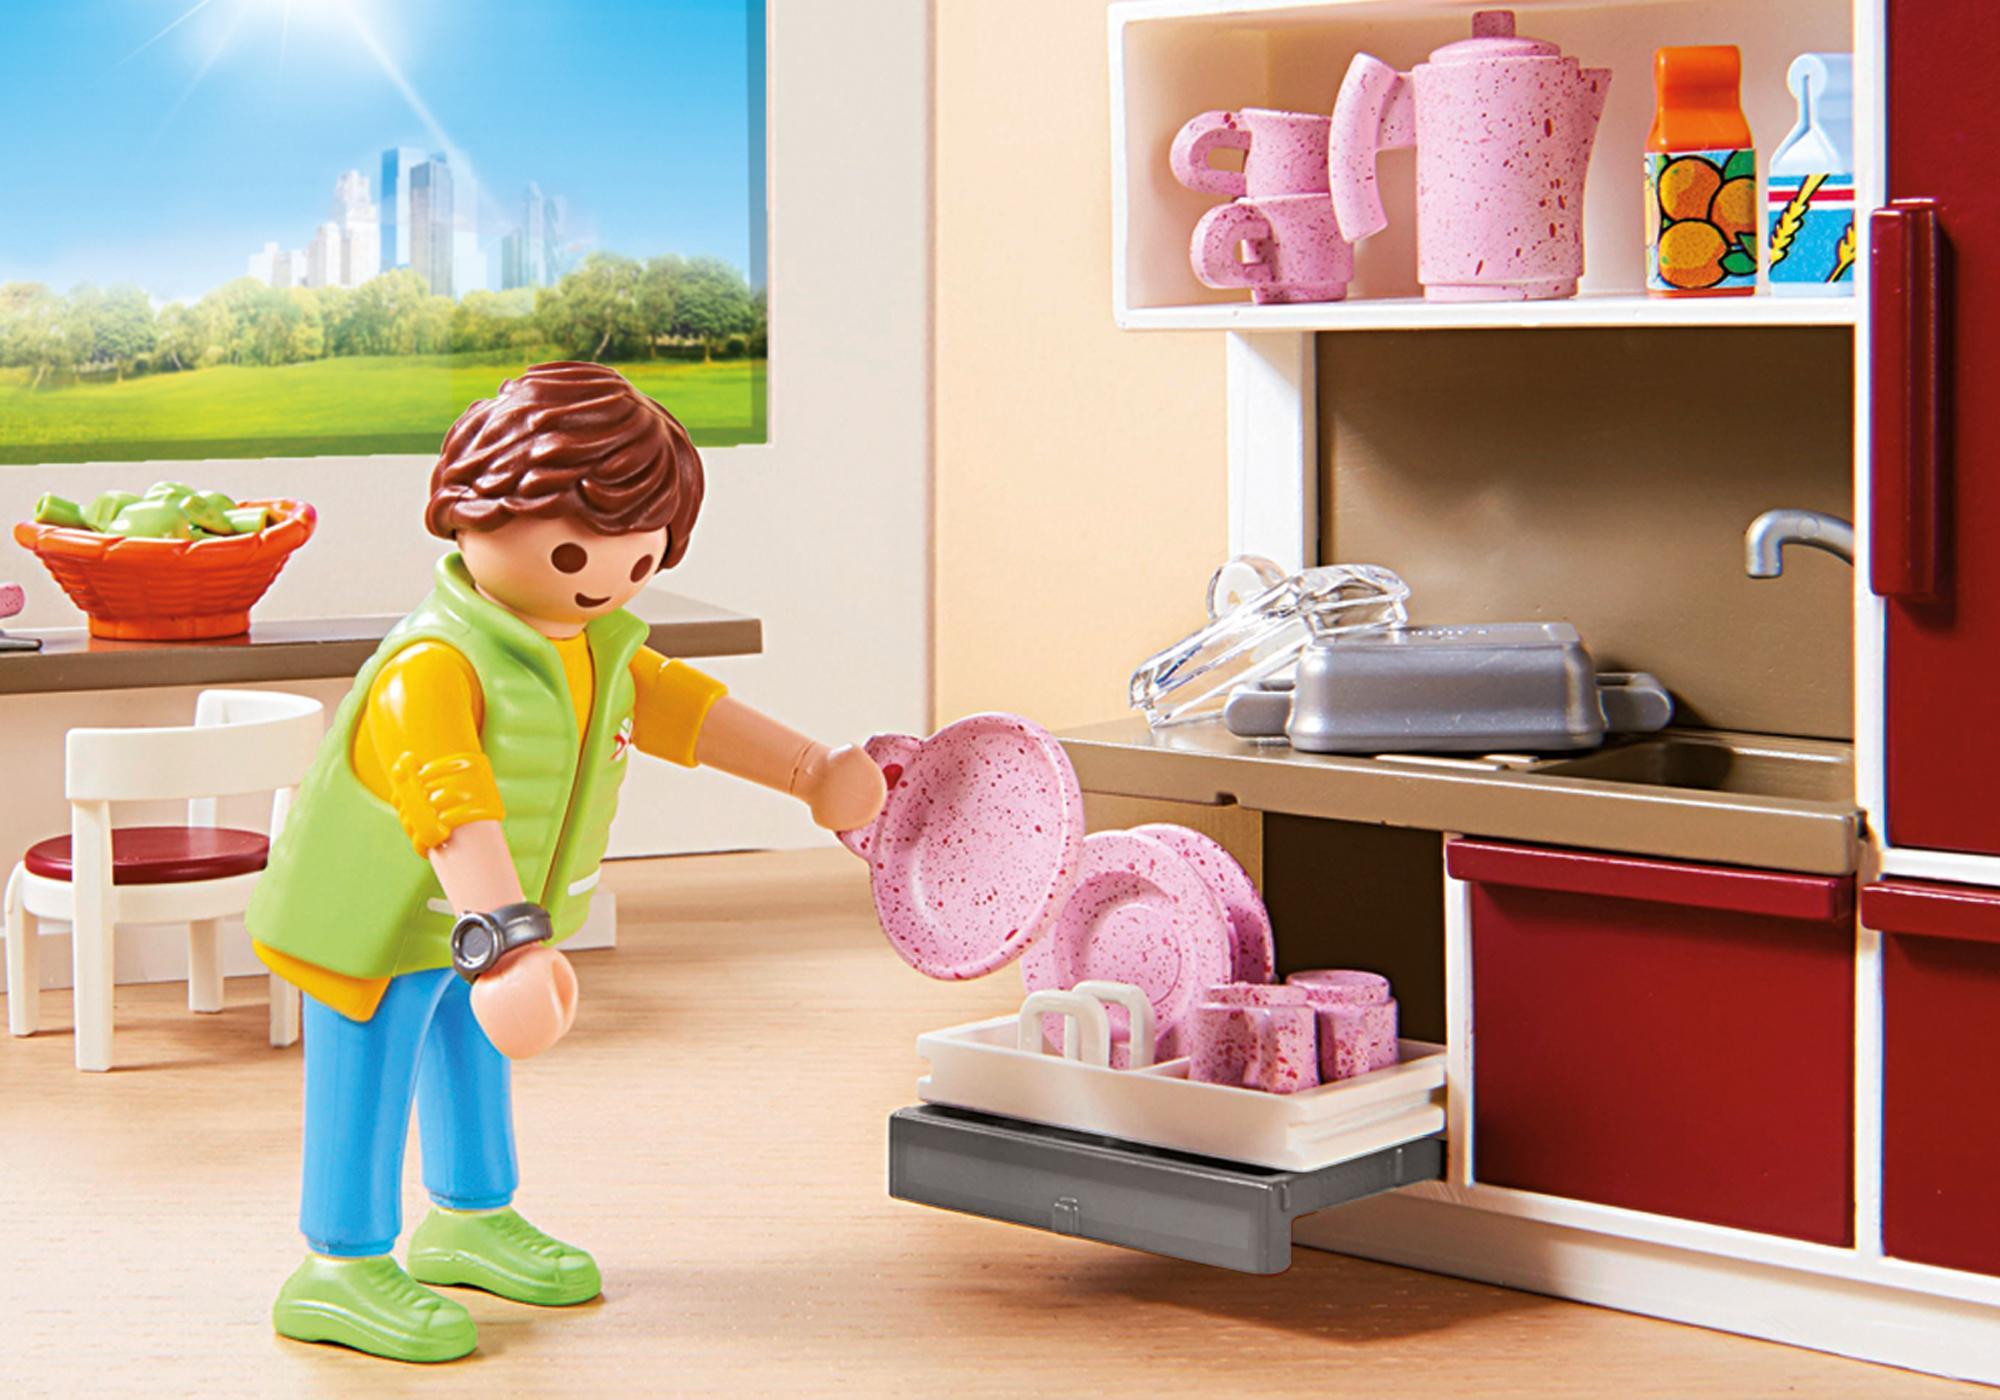 http://media.playmobil.com/i/playmobil/9269_product_extra2/Kitchen